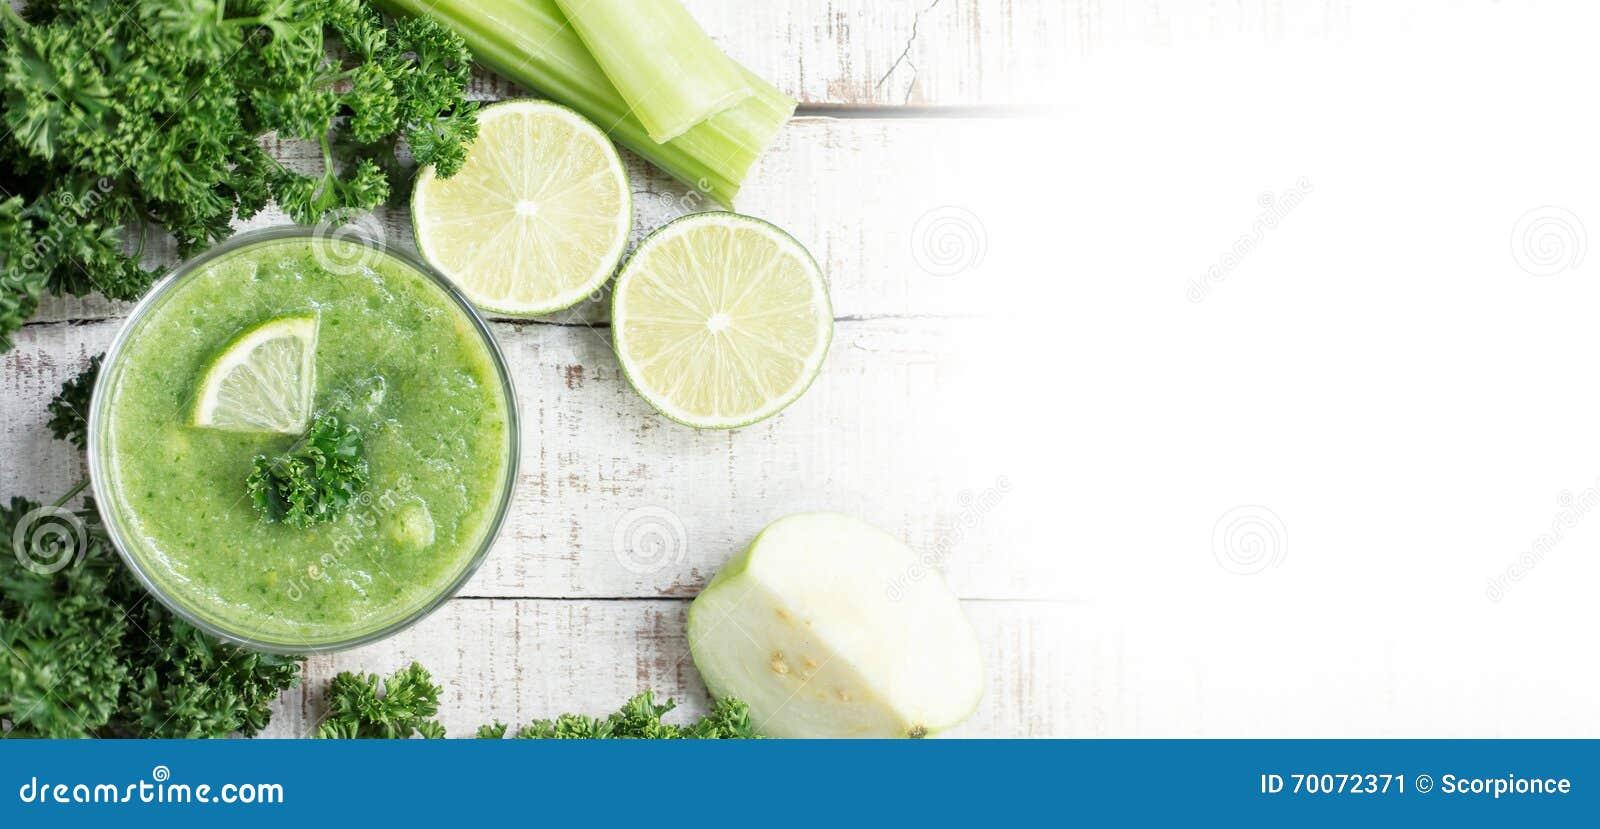 sedano bevanda detox dieta purificante e dimagrante